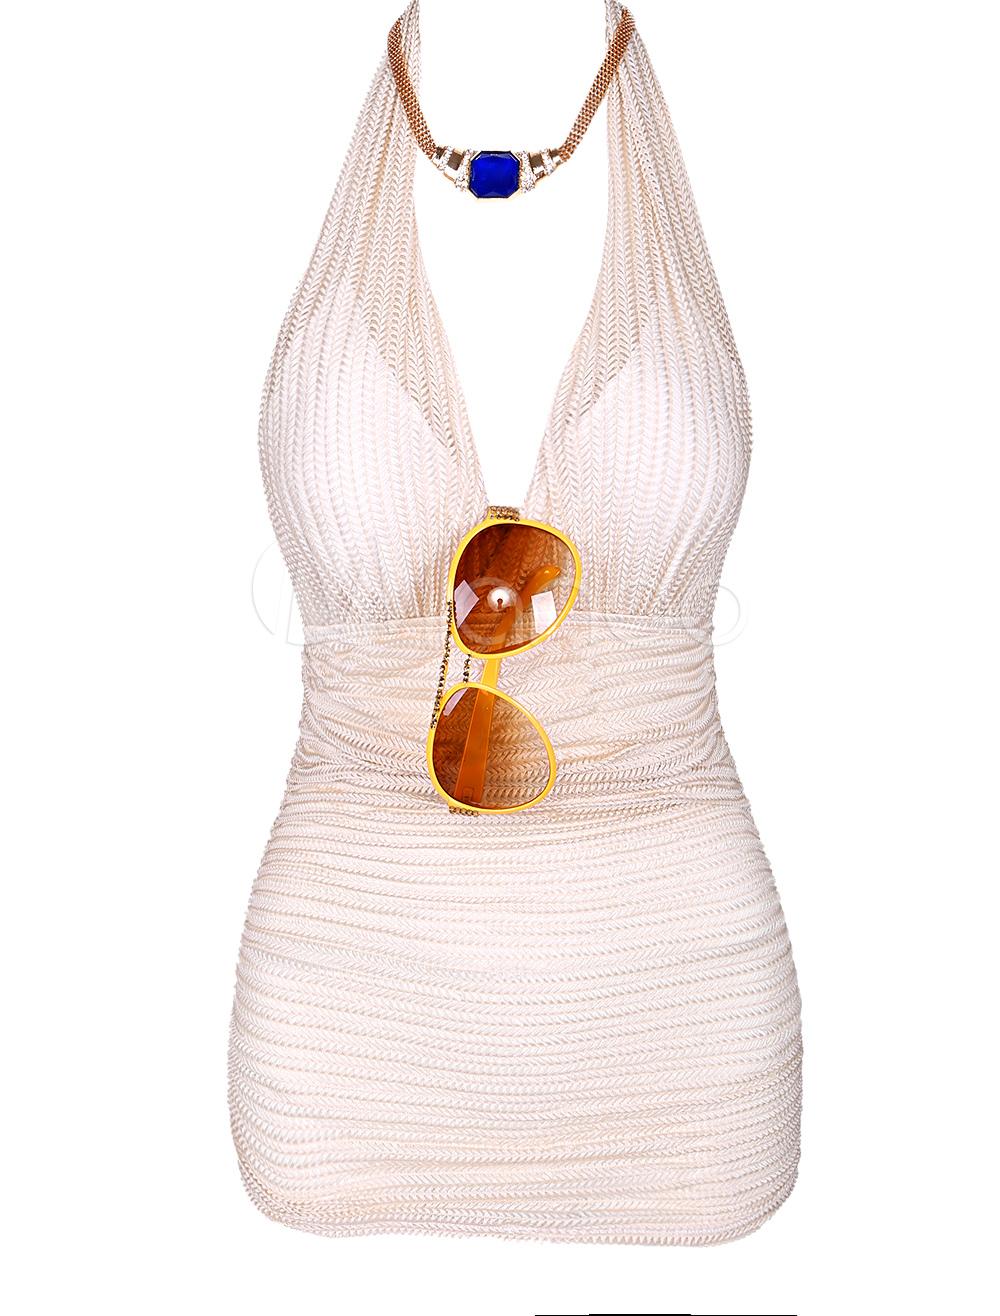 Juicy couture tracksuit Halter Plain Casual Bikini xcvi exercise